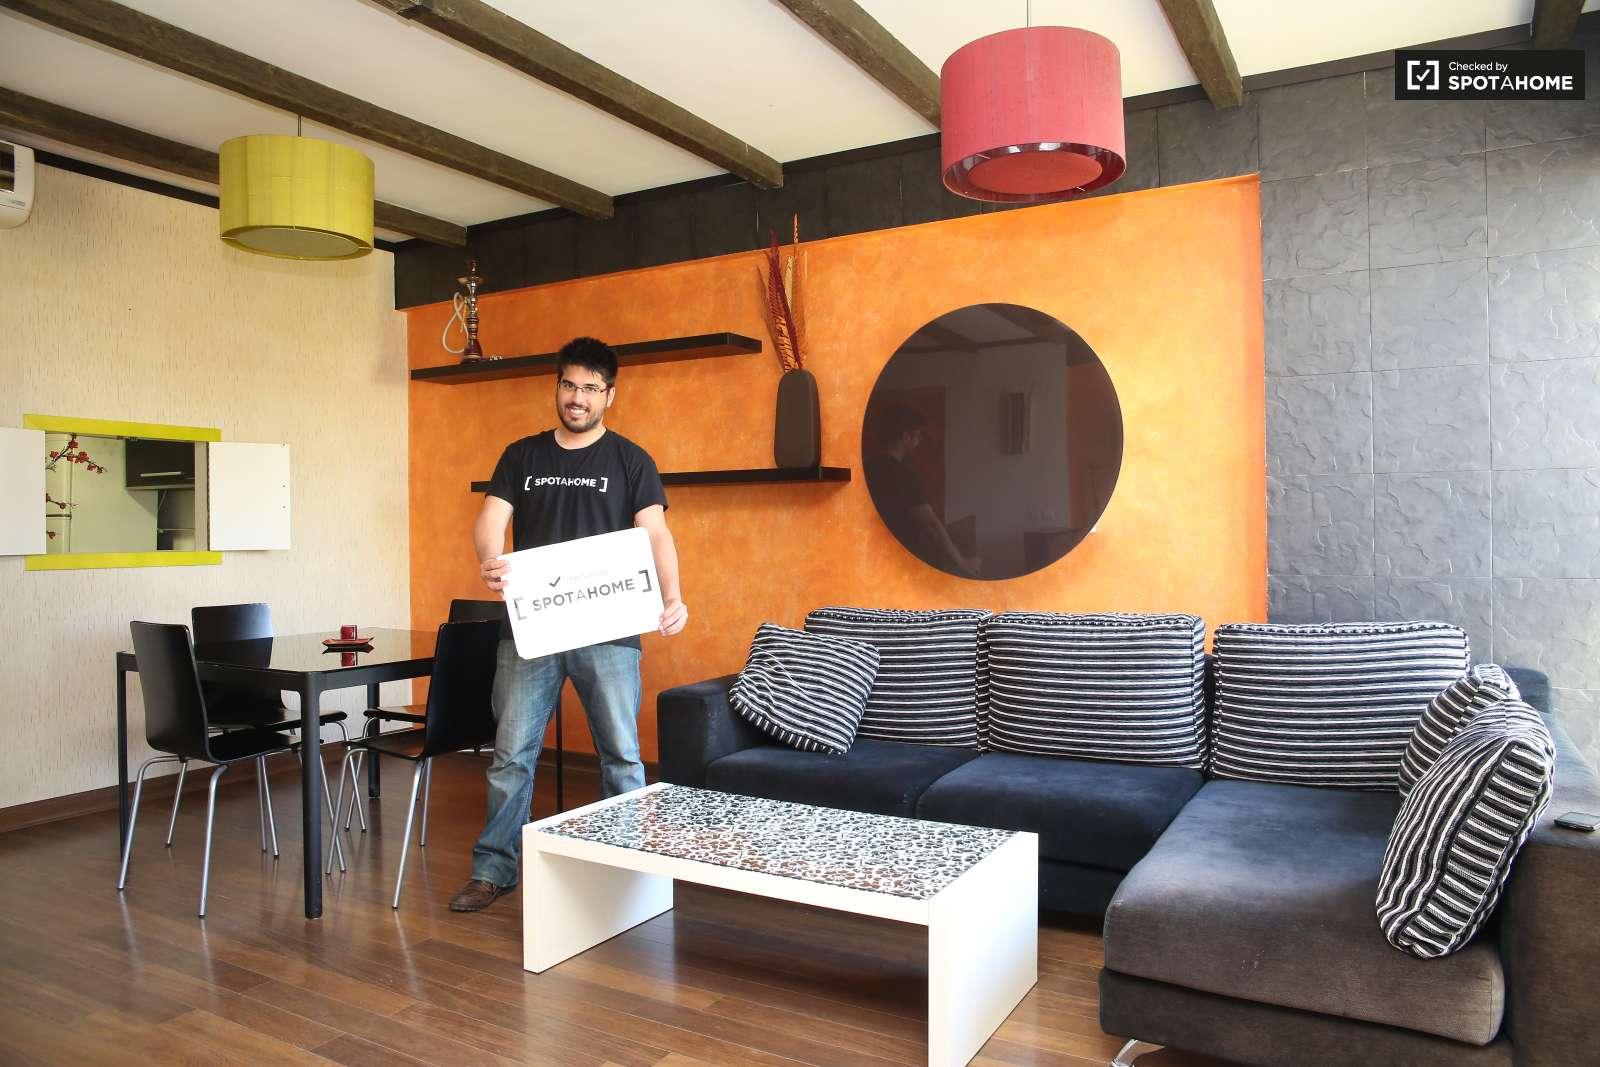 Gran Piso De 1 Habitaci N En Nervi N Sevilla Ref 89008 Spotahome # Muebles Nervion